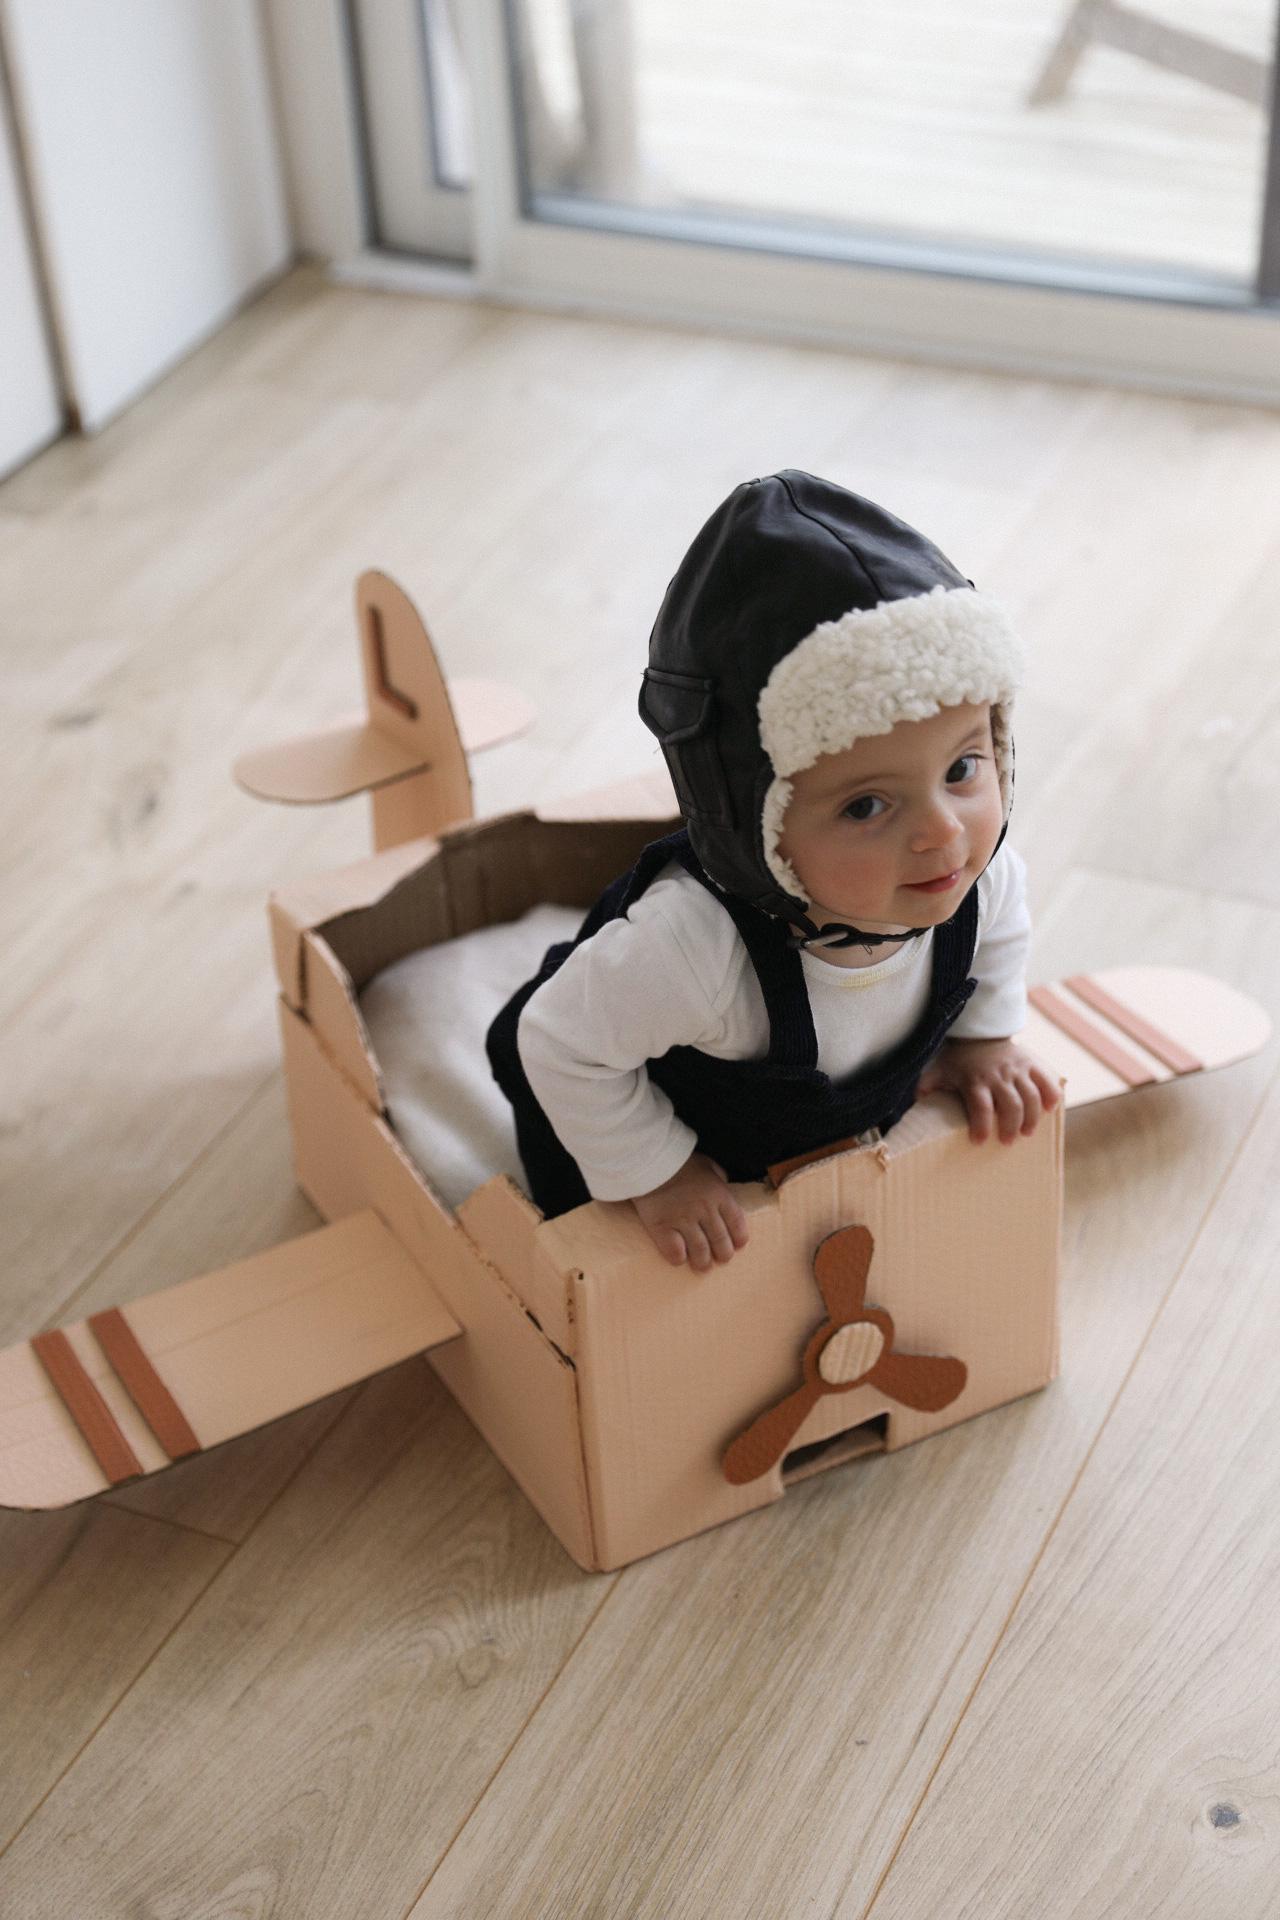 diy plane cardboard